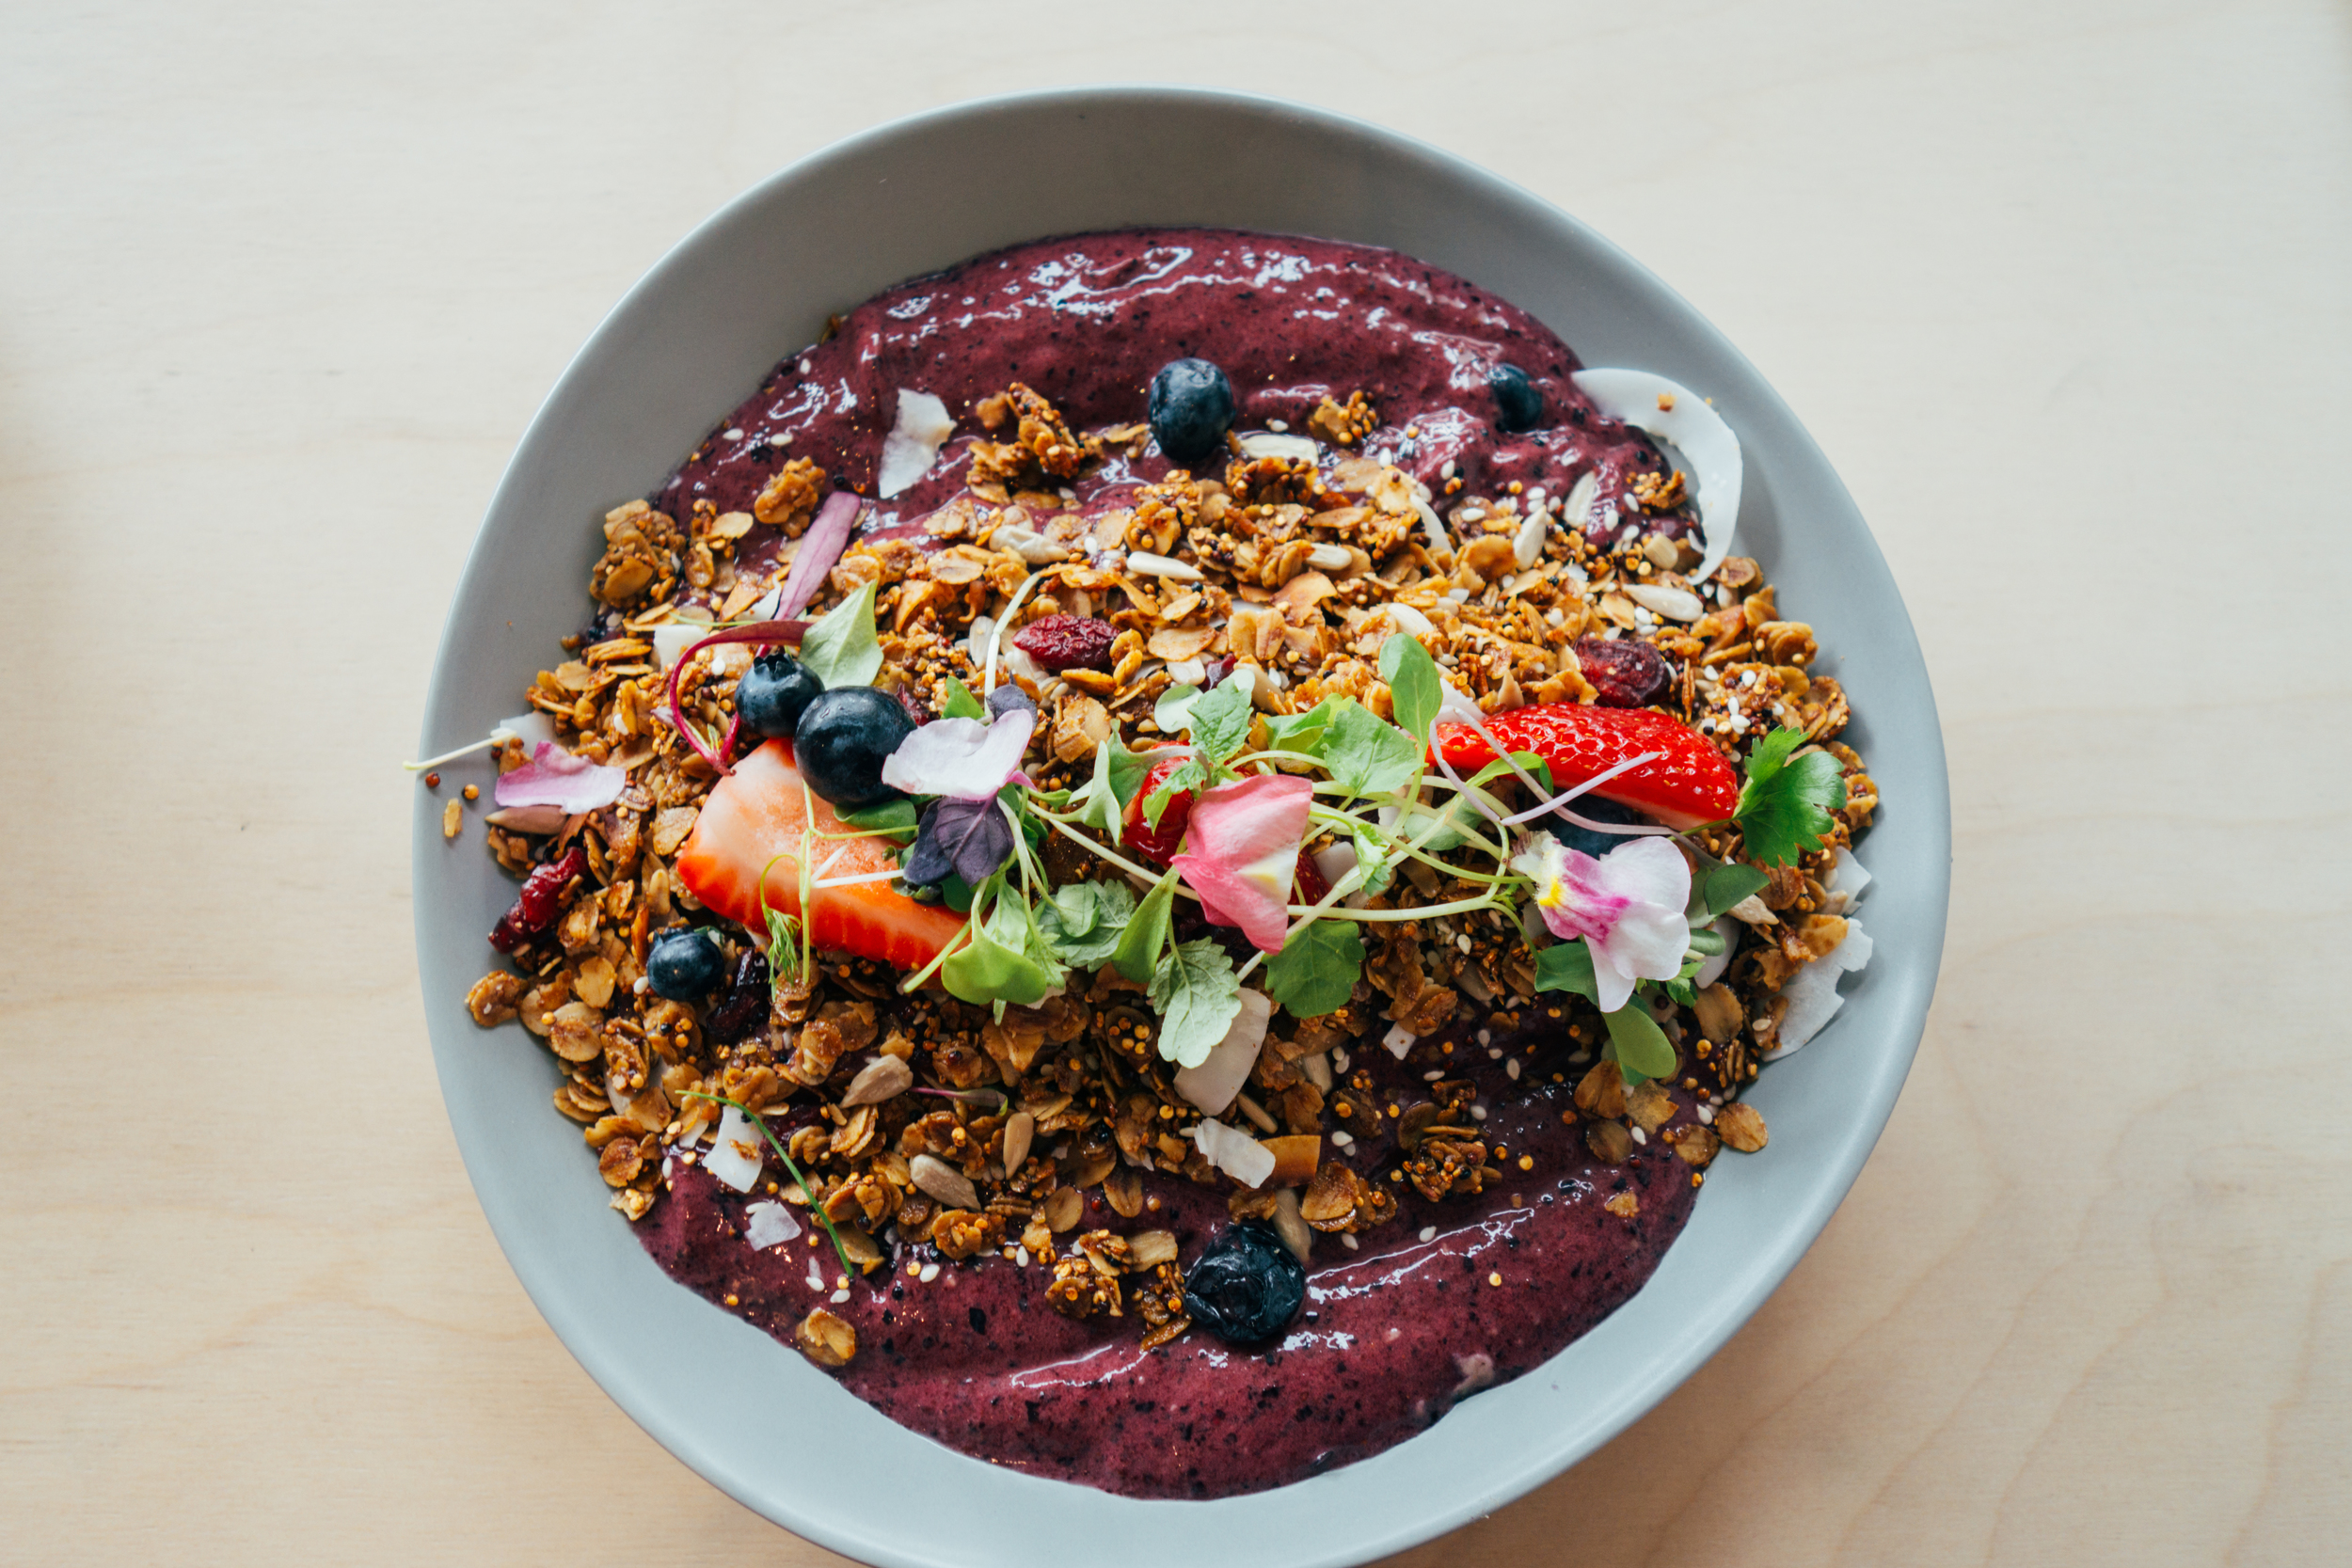 acai berry smoothie bowl lucy lockett